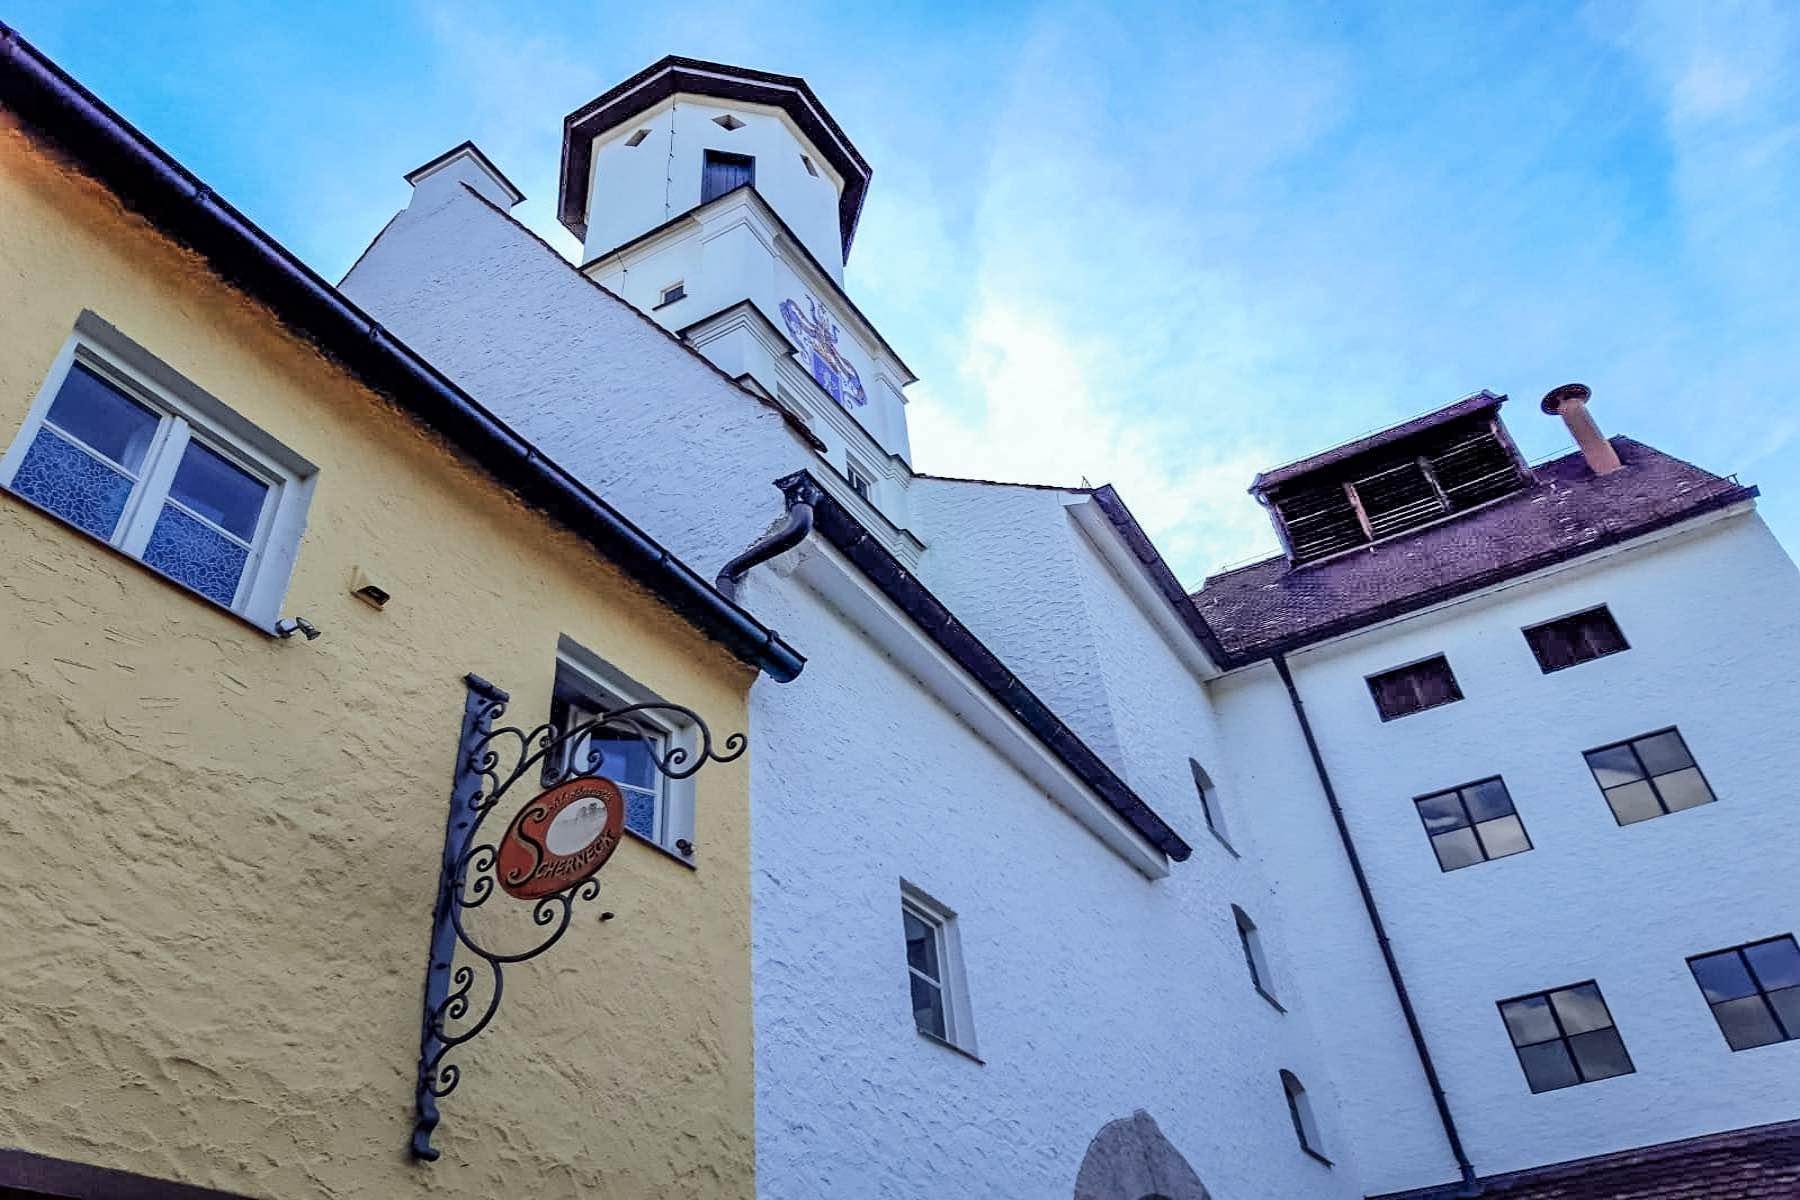 geheimtipp Augsburg Schloß Scherneck